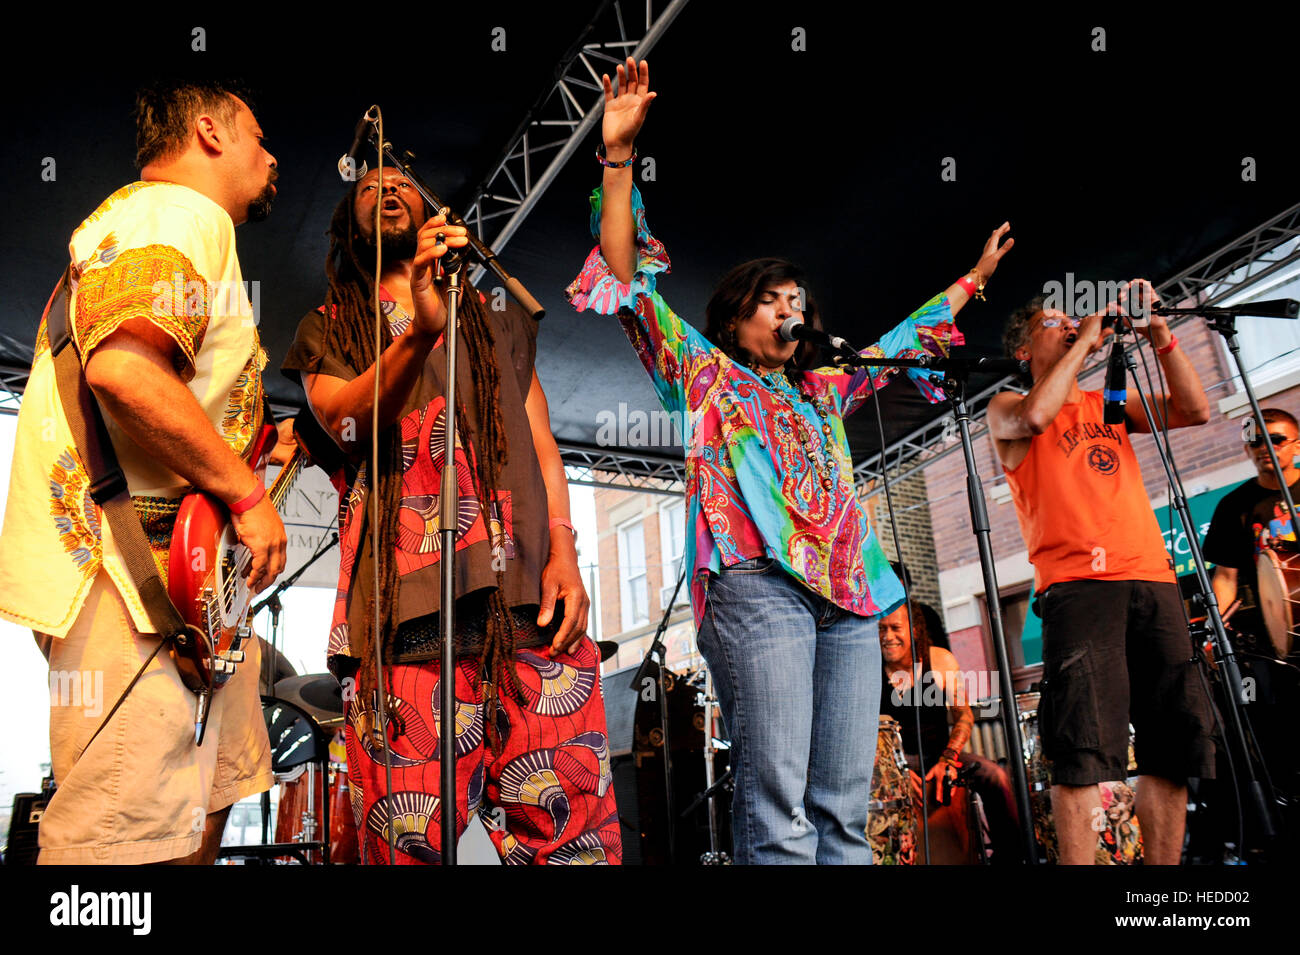 Chicago musical group, Funkadesi, playing at local neighborhood festival. - Stock Image